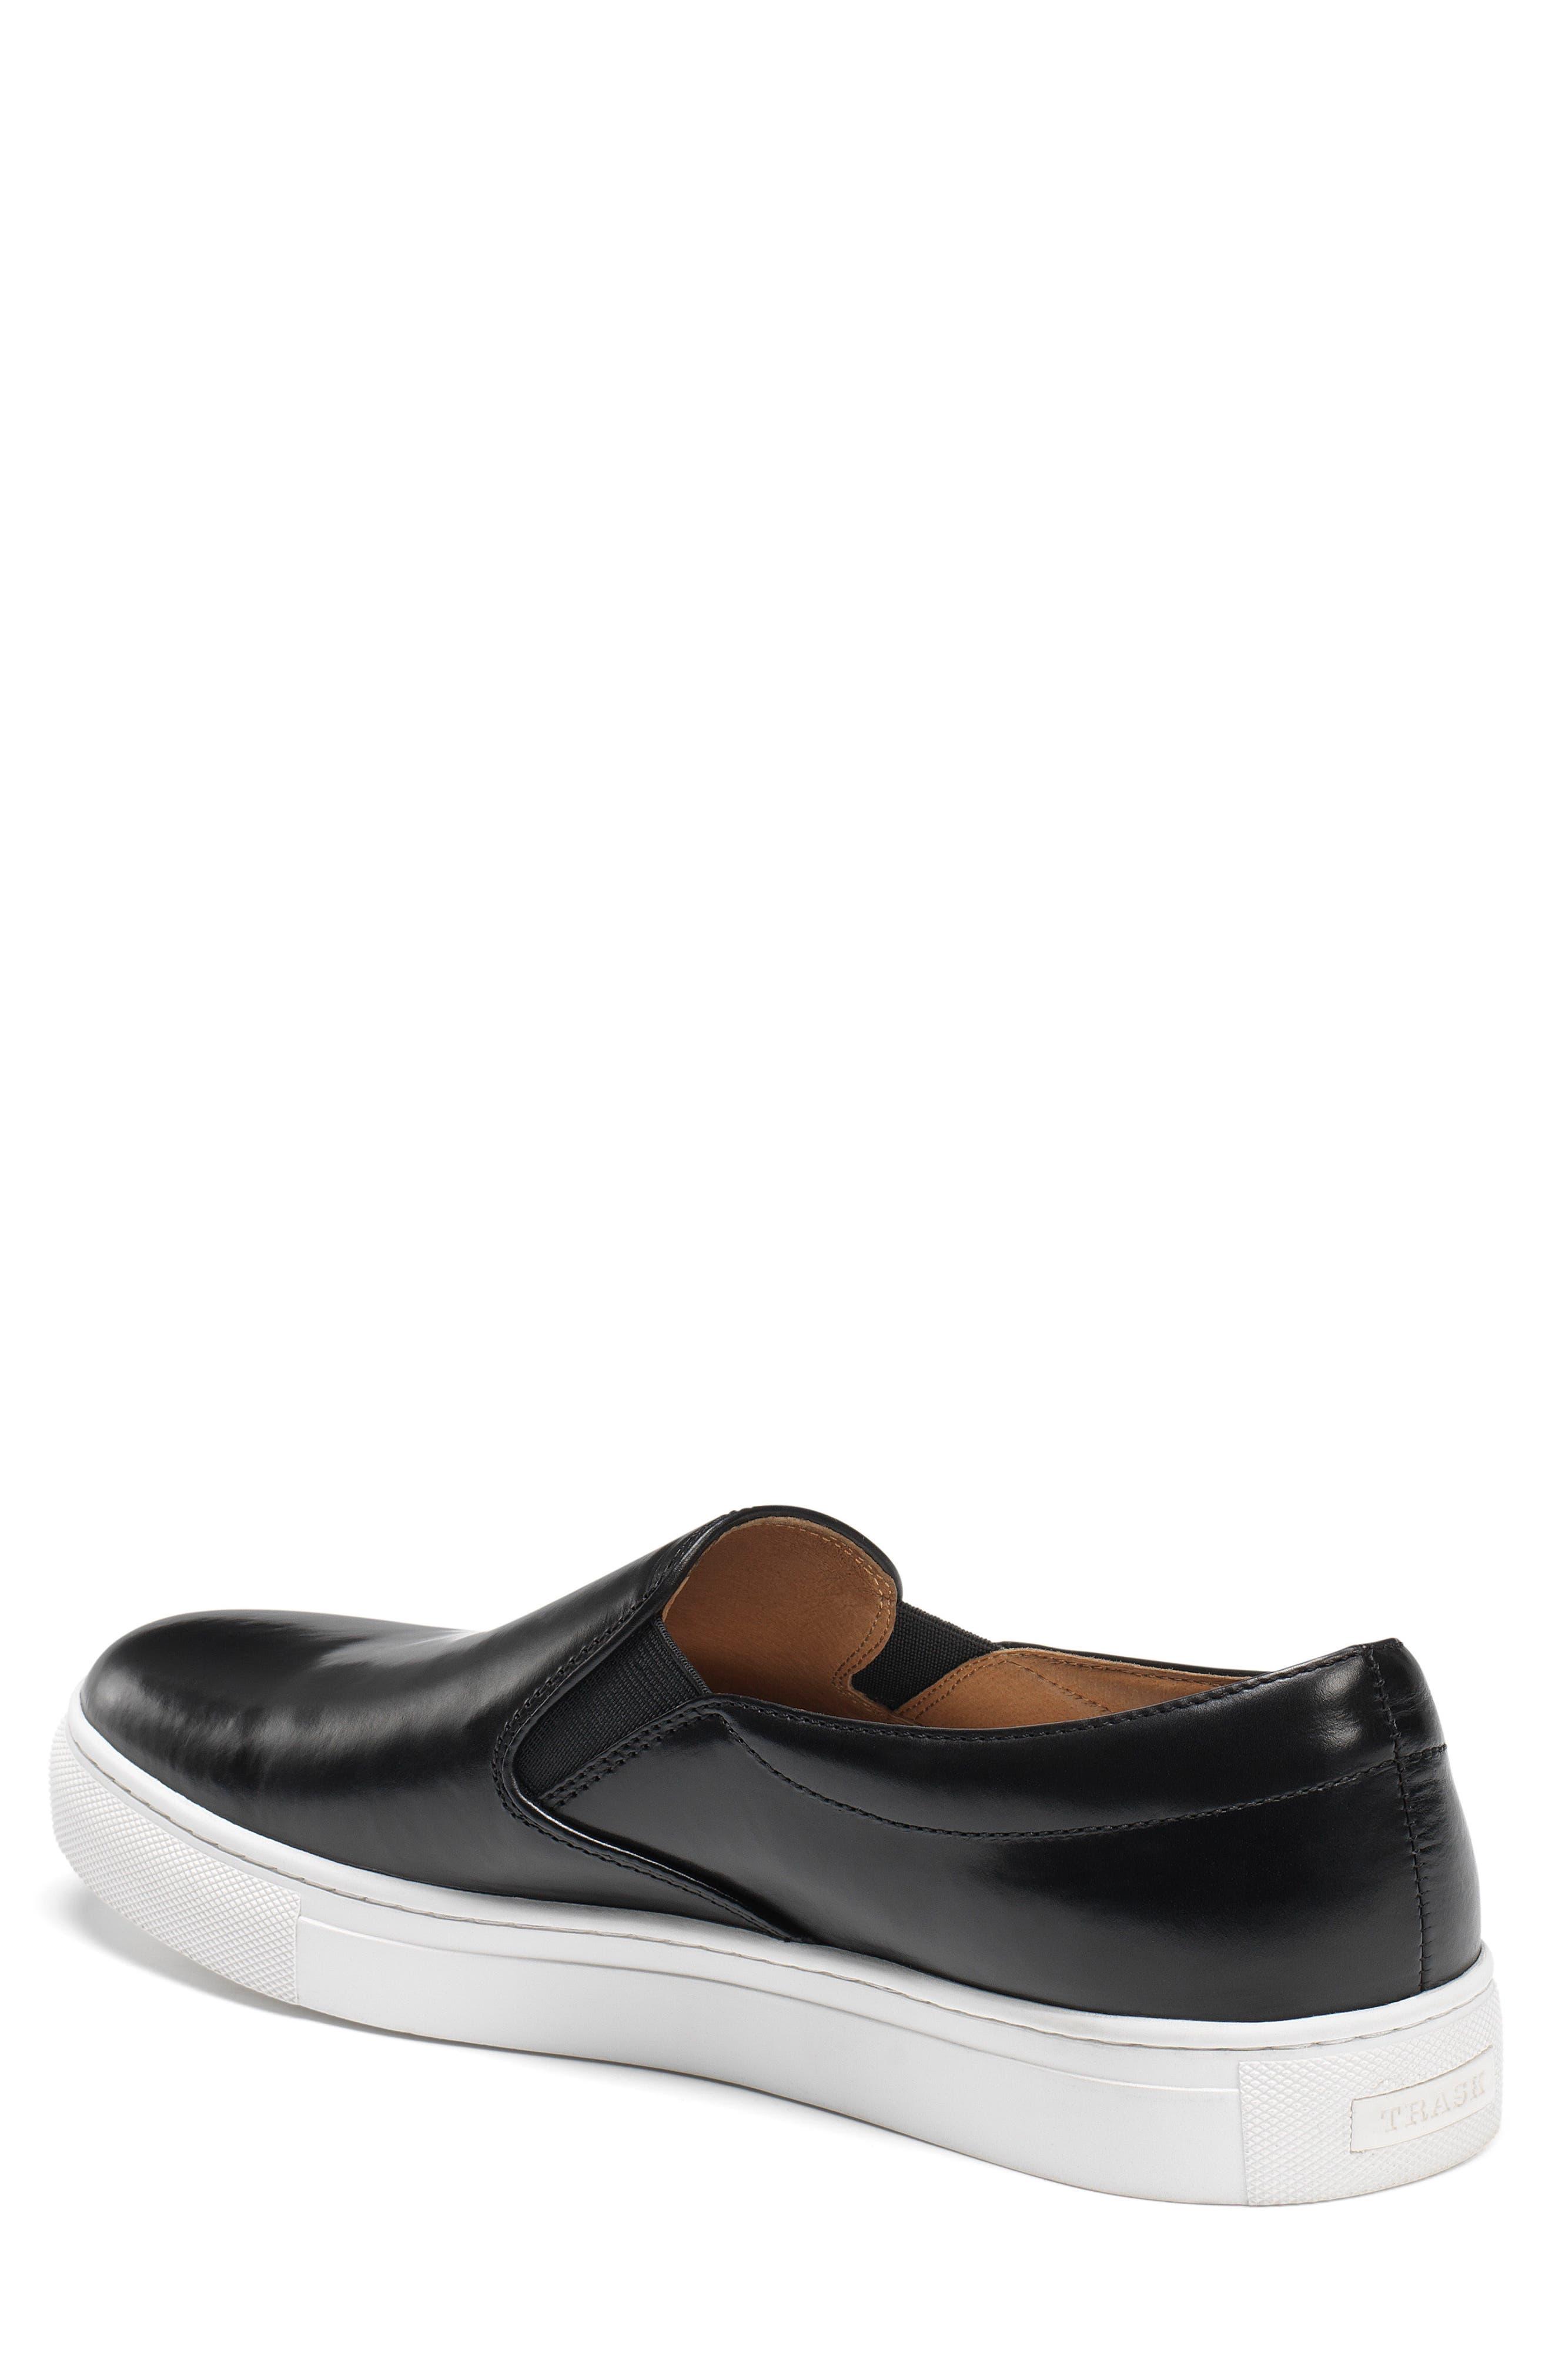 Alex Slip-On Sneaker,                             Alternate thumbnail 2, color,                             BLACK LEATHER